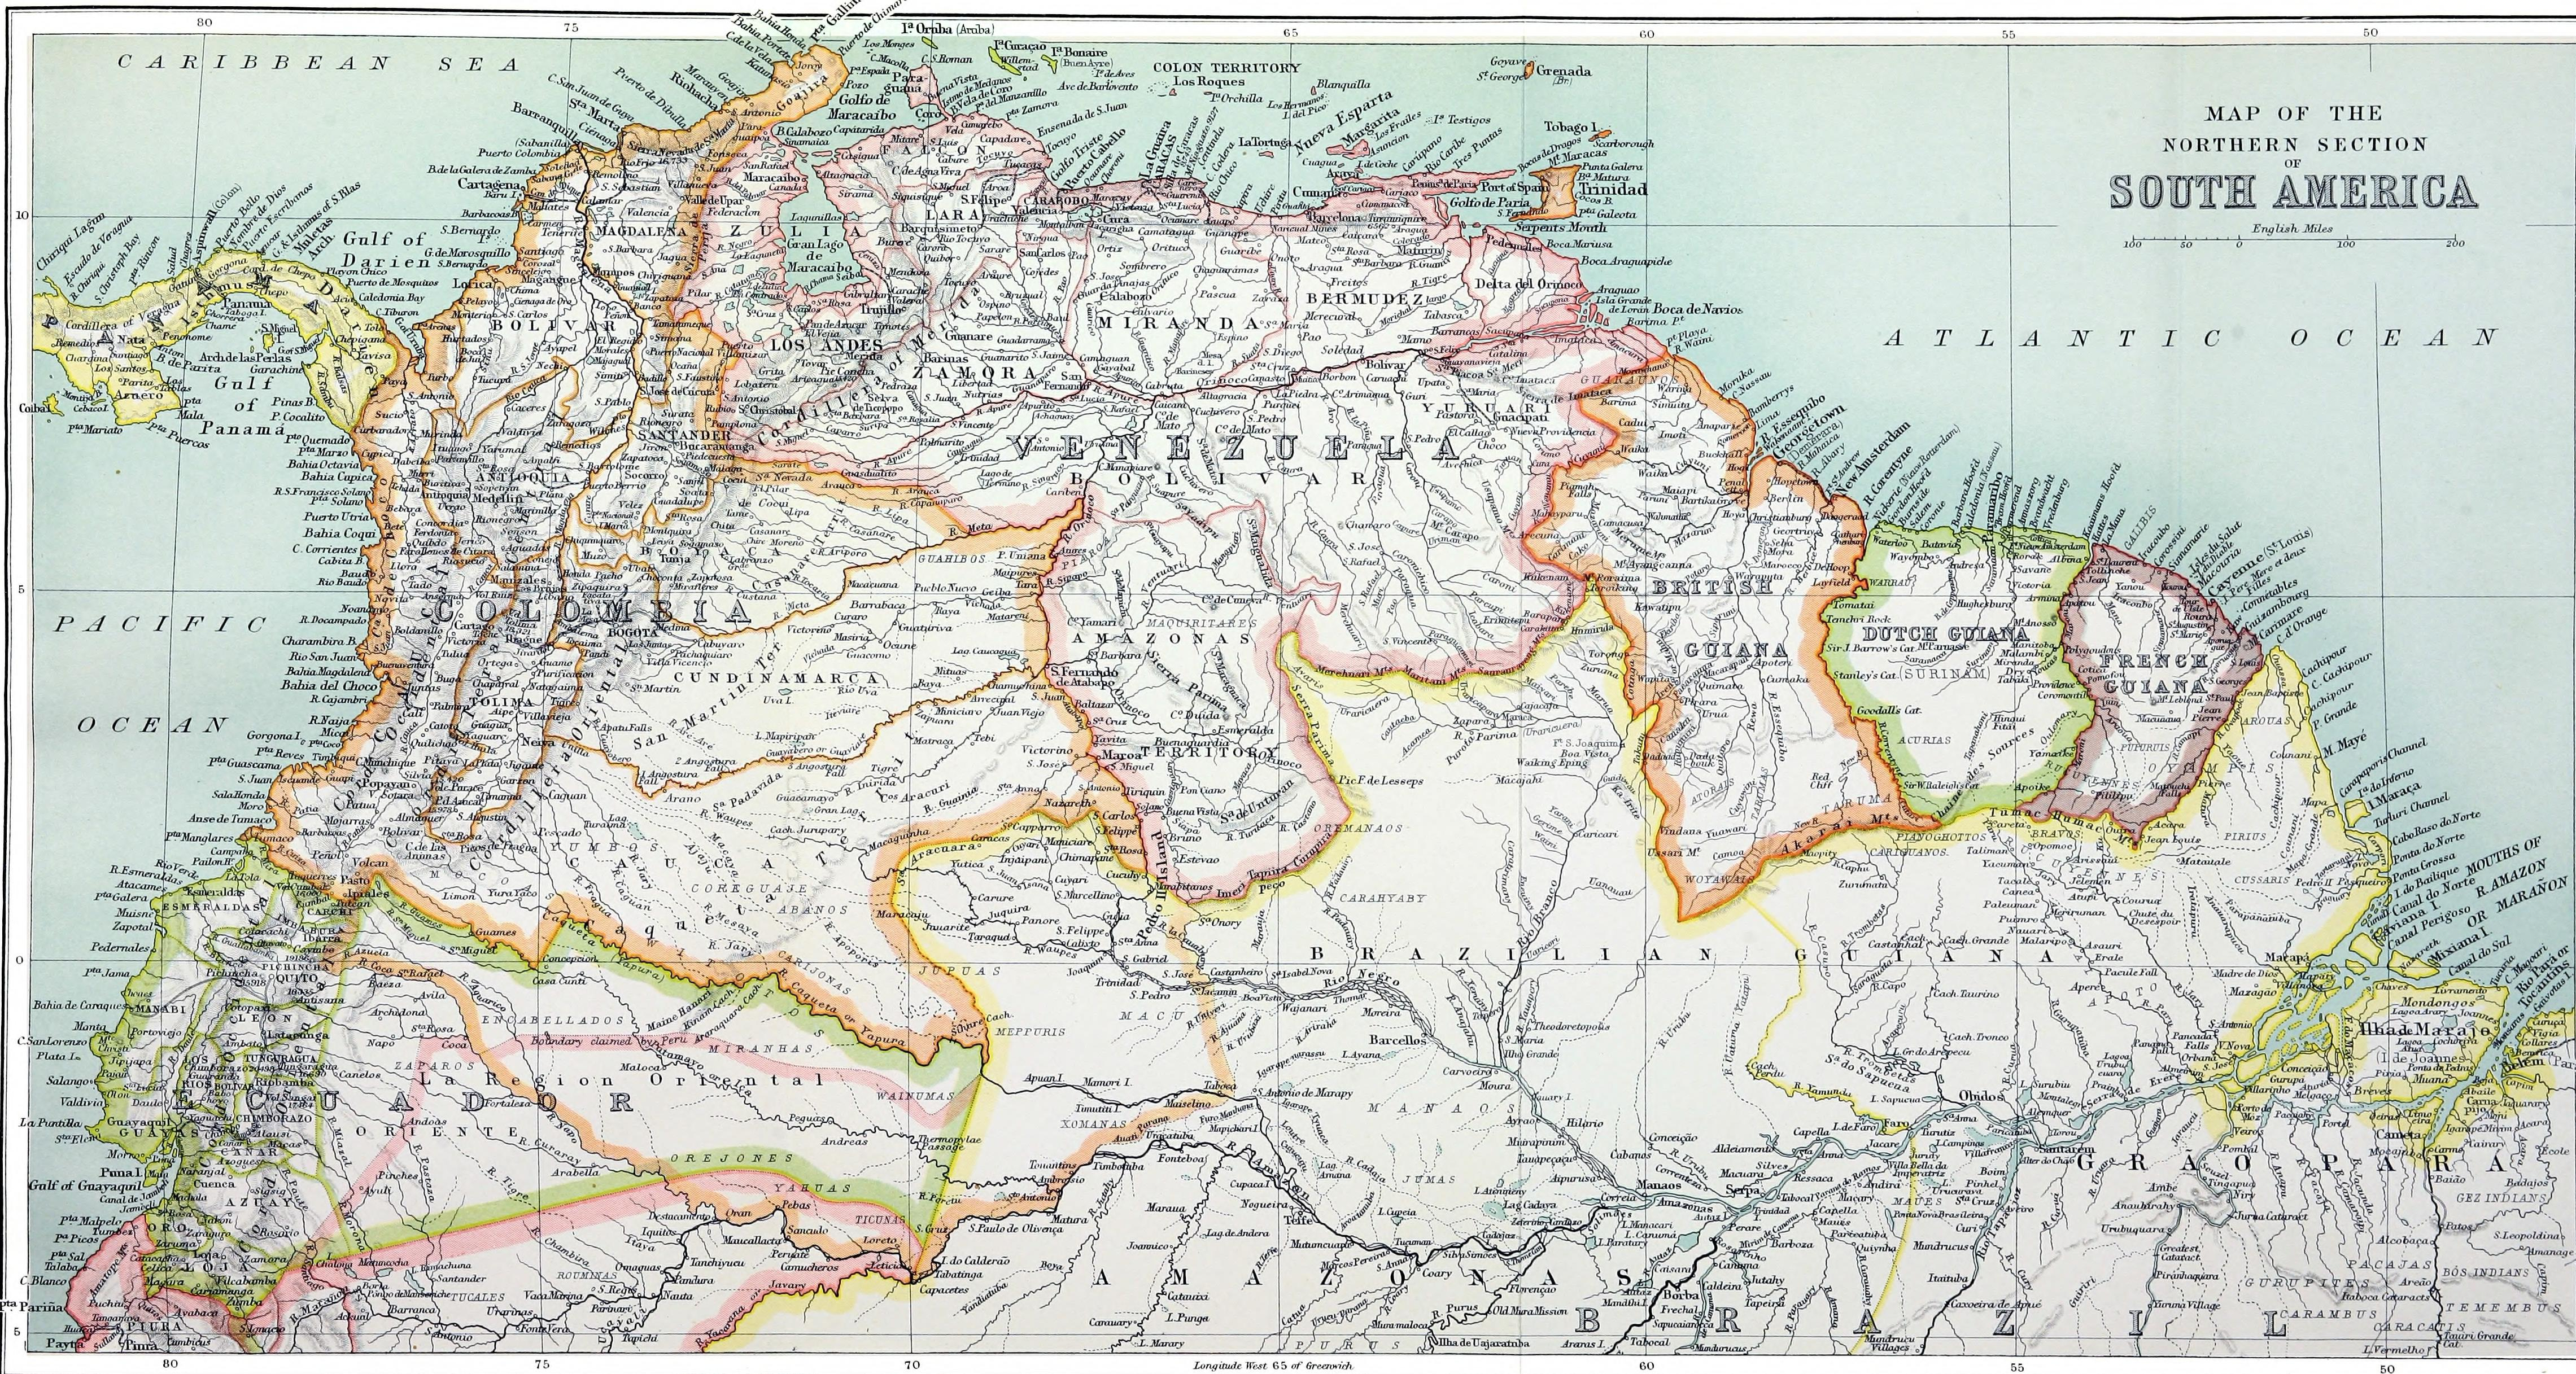 filea history of south america 18541904 1905